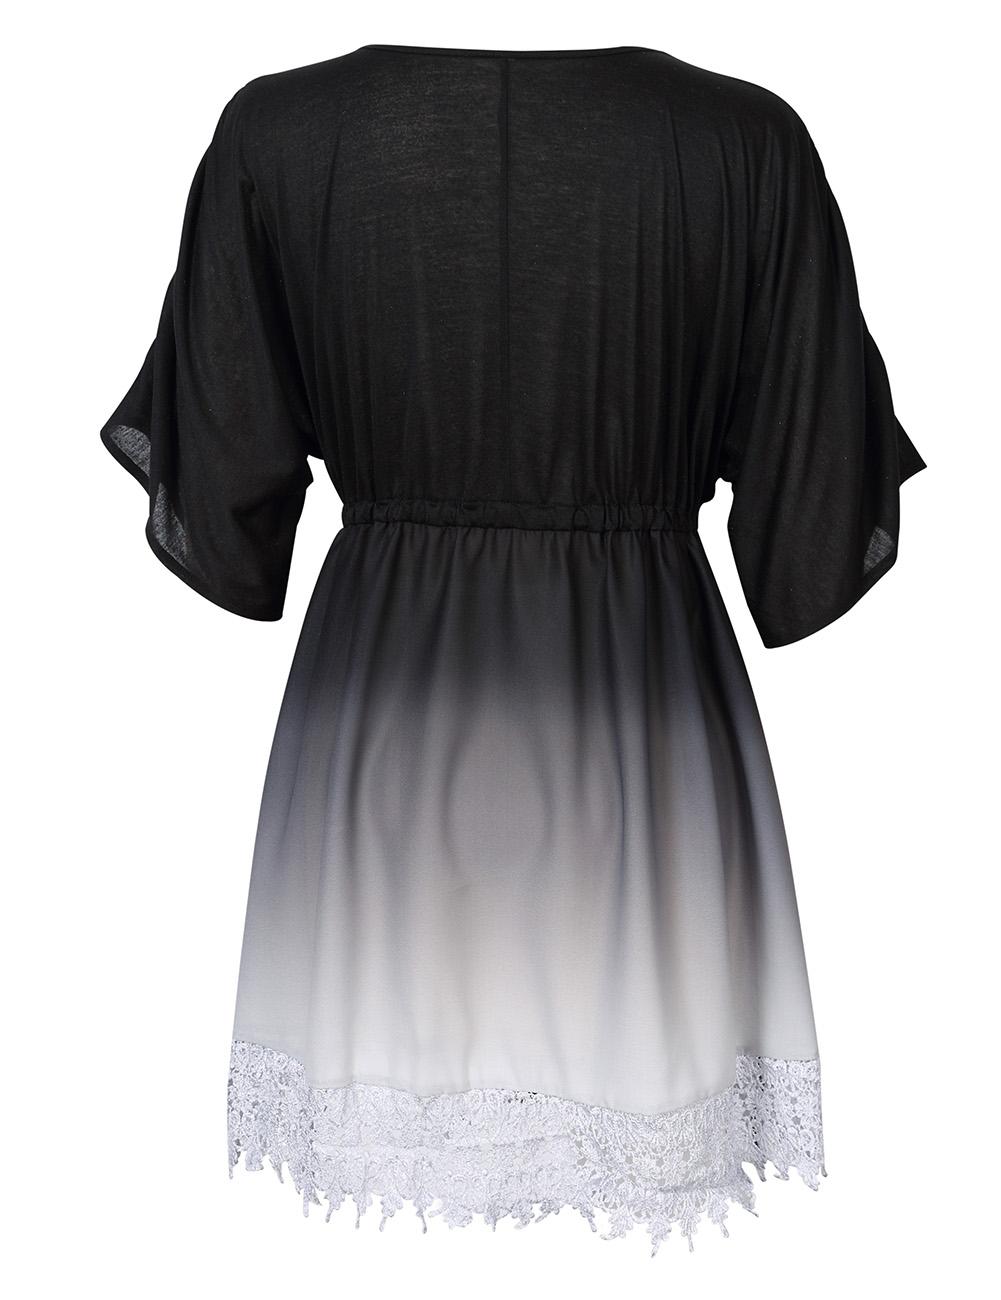 bergr e damen sommerkleid partykleid abendkleider strandkleid mini kleider ebay. Black Bedroom Furniture Sets. Home Design Ideas